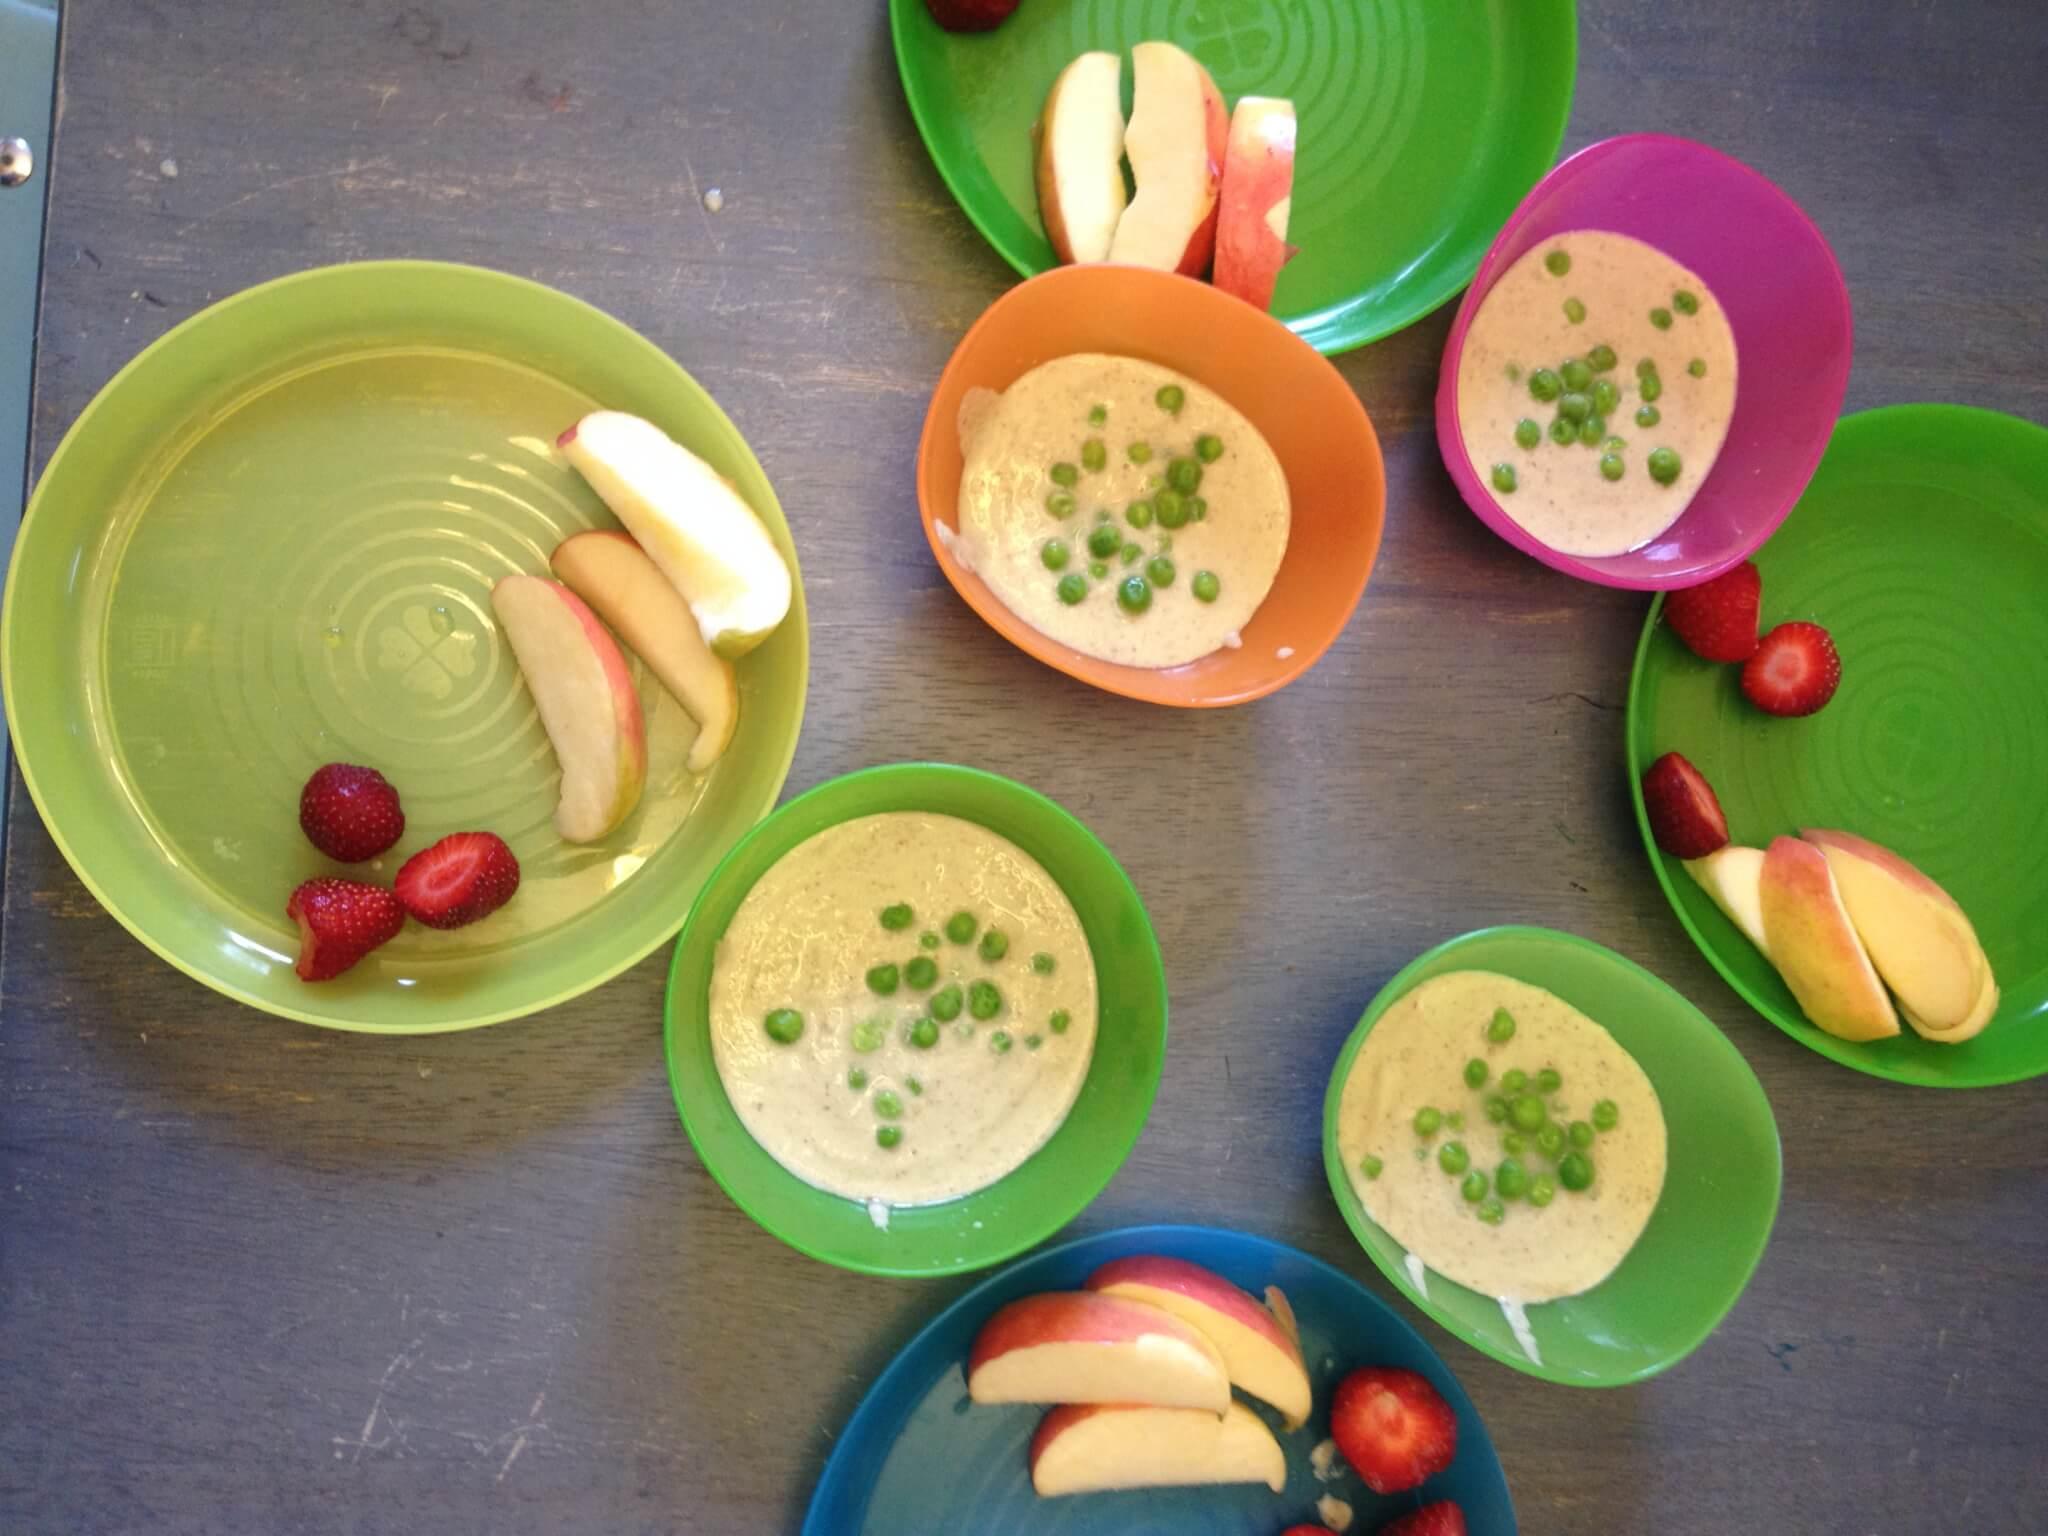 tennis lunch idea for preschoolers